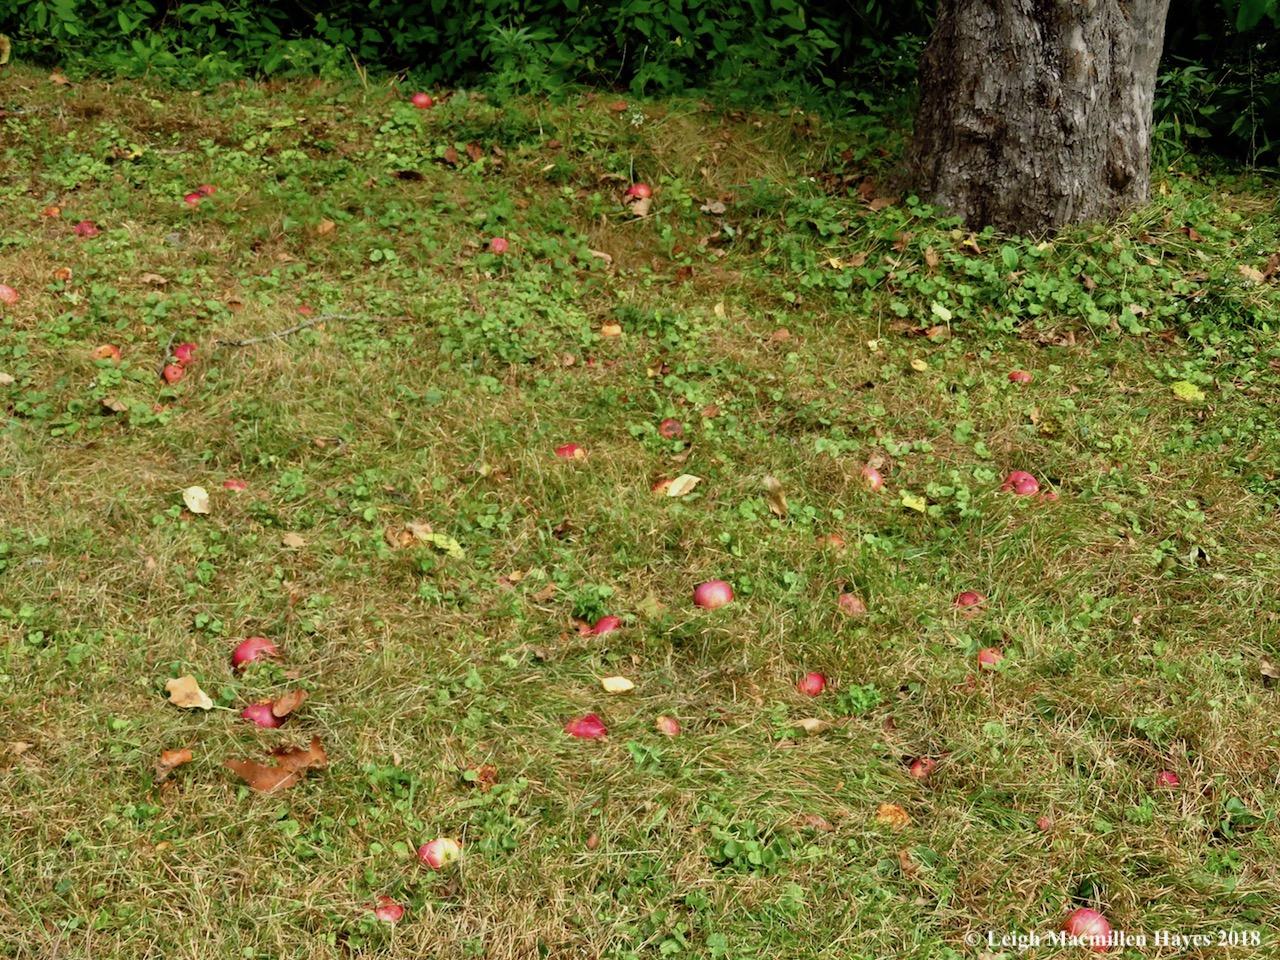 17-apples on ground